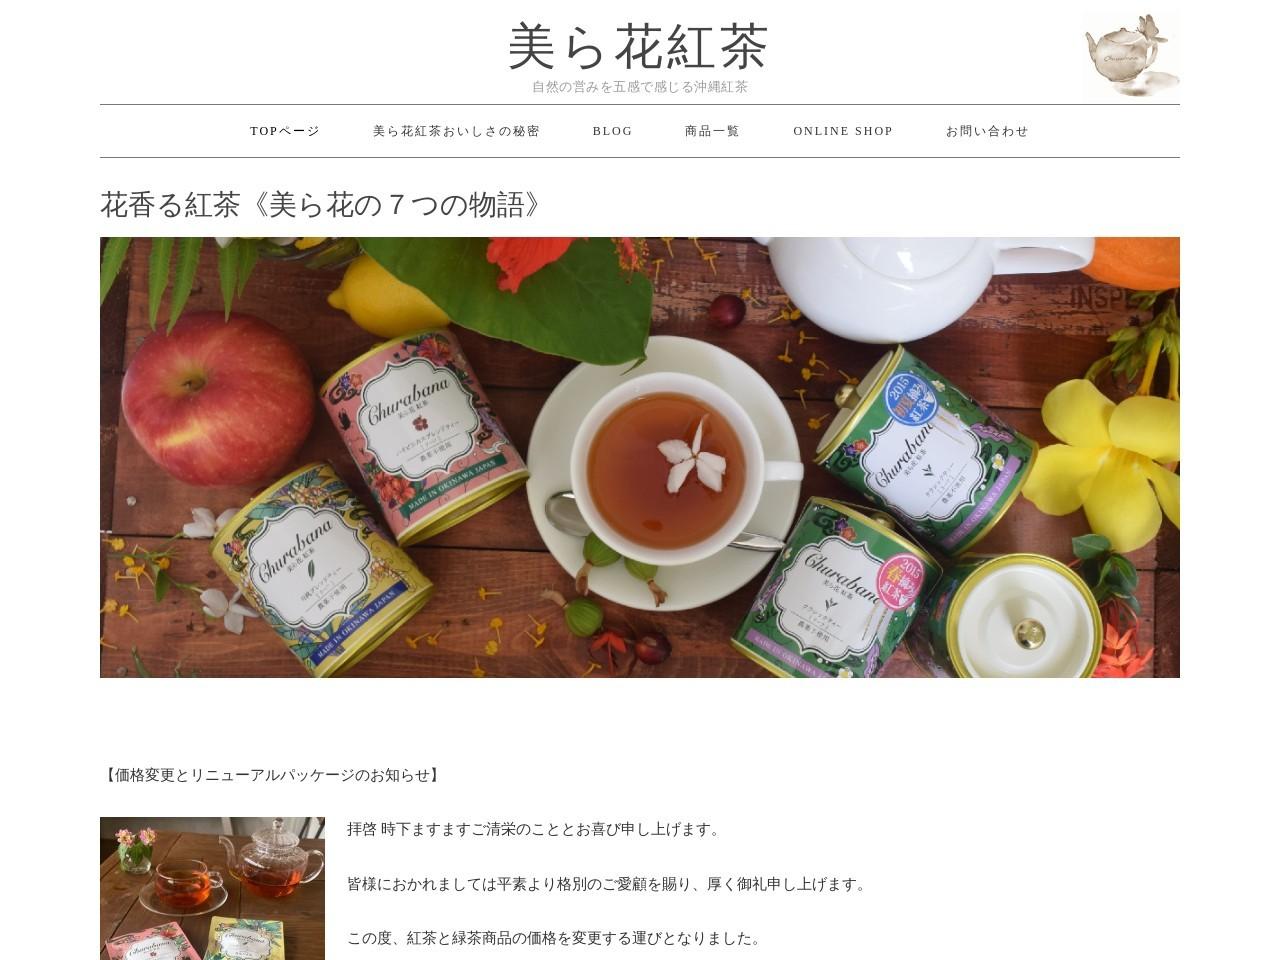 美ら花紅茶 無農薬栽培100%沖縄産の紅茶